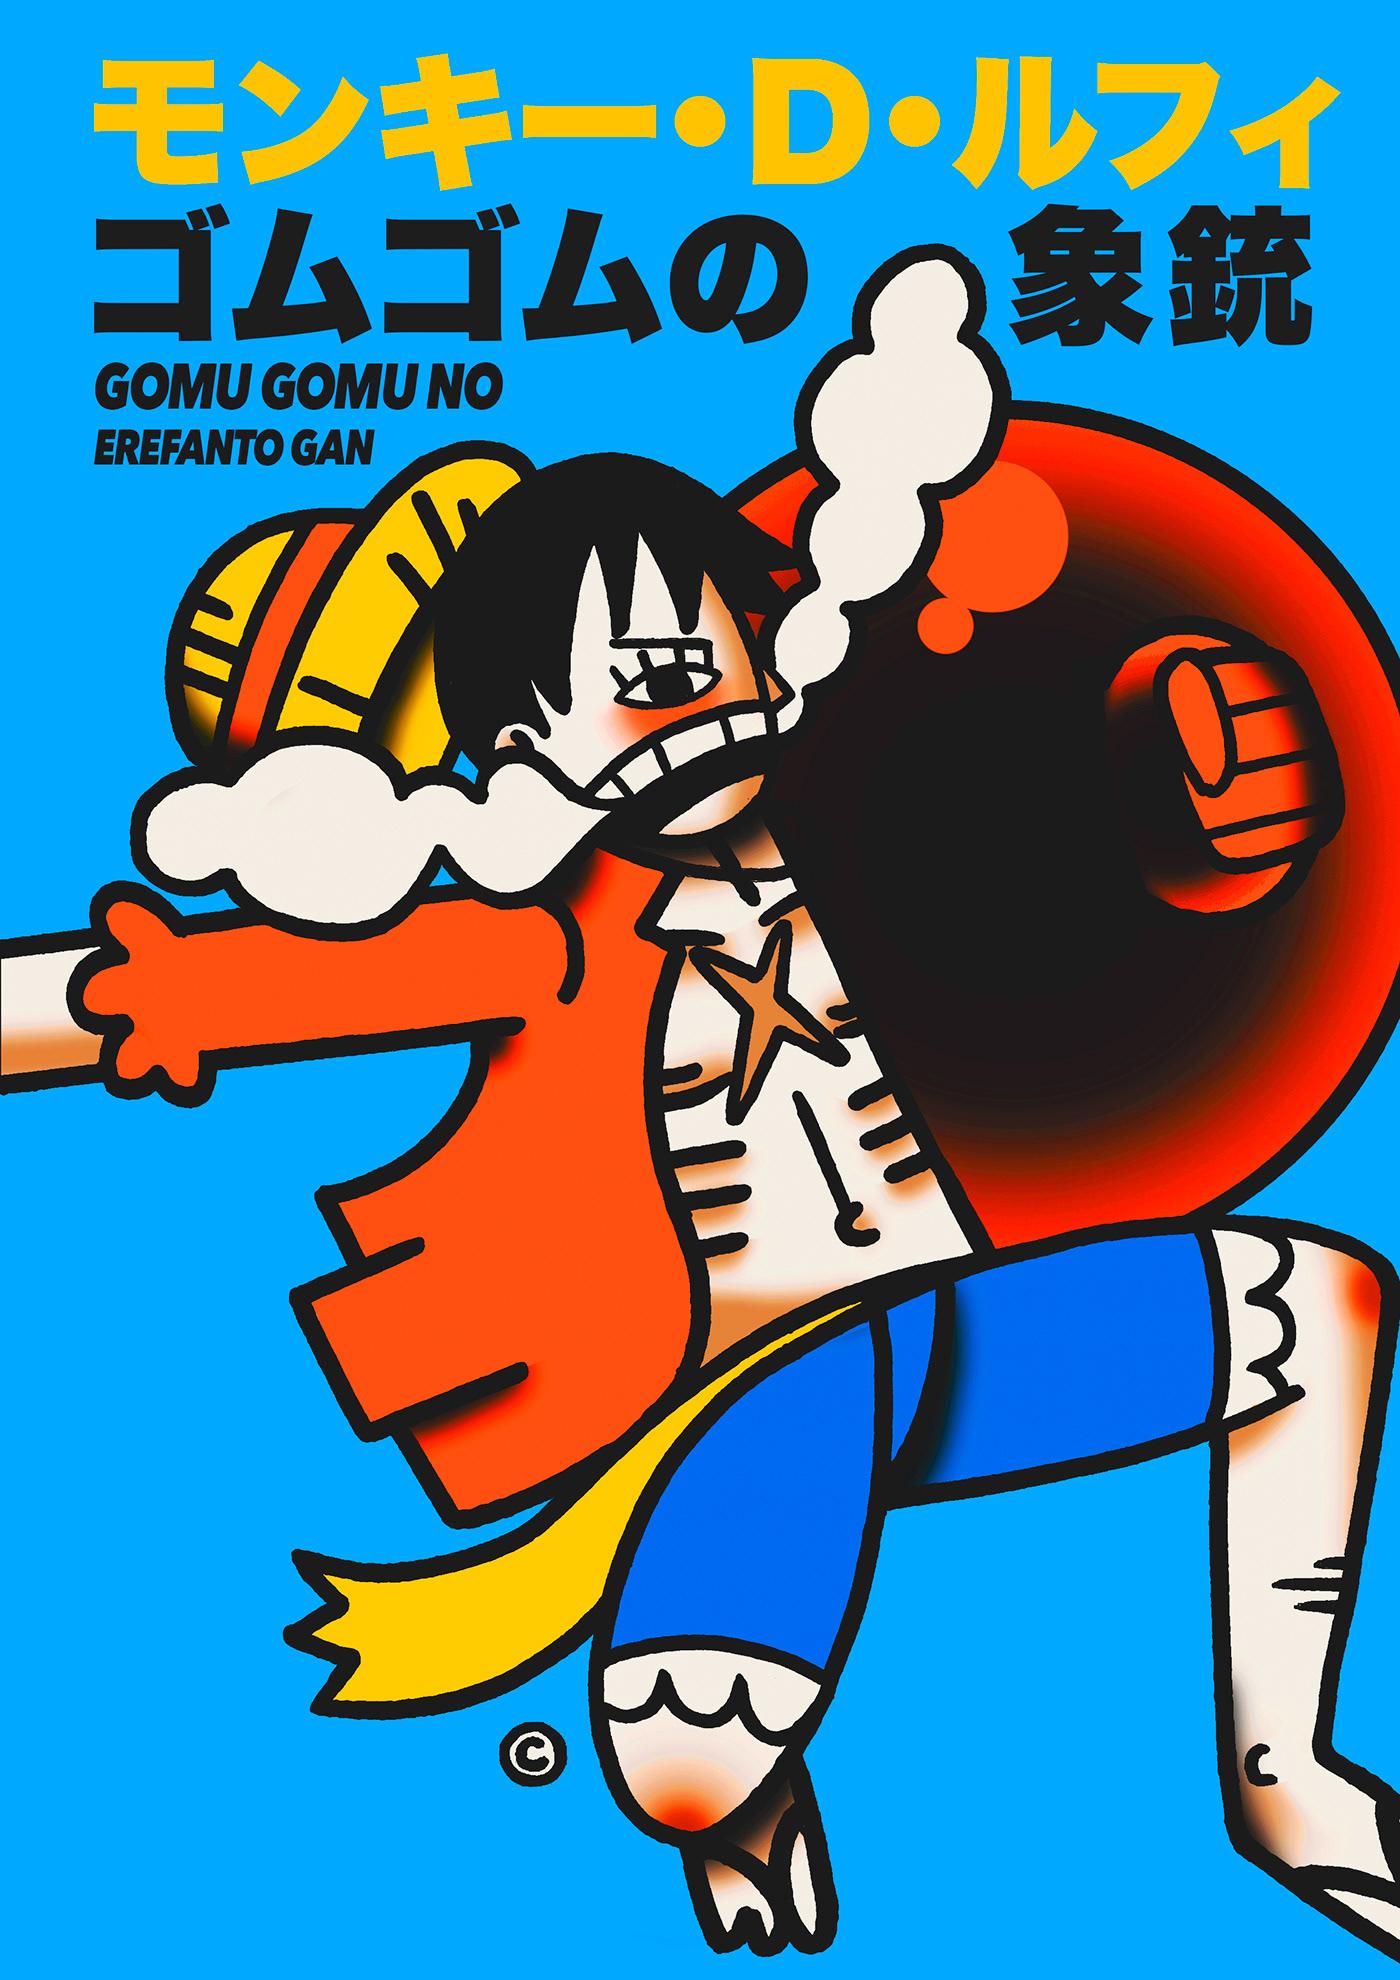 Onepiece luffy manga japan ILLUSTRATION  Illustrator art Drawing  colors